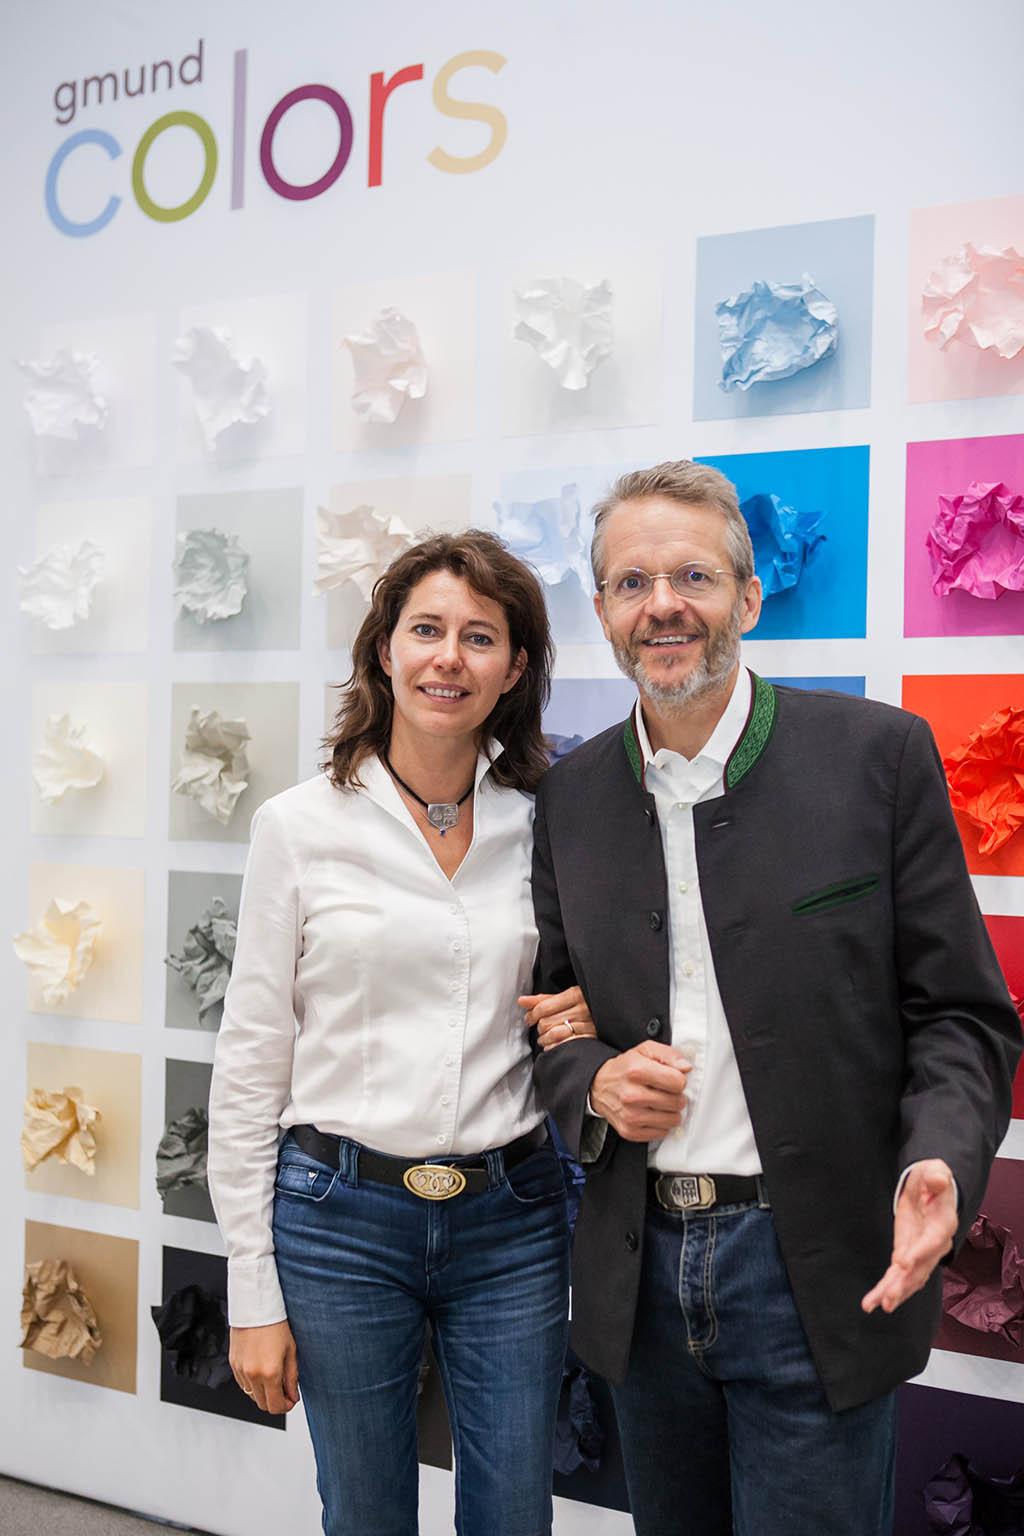 Florian Kohler und Irina Kohler